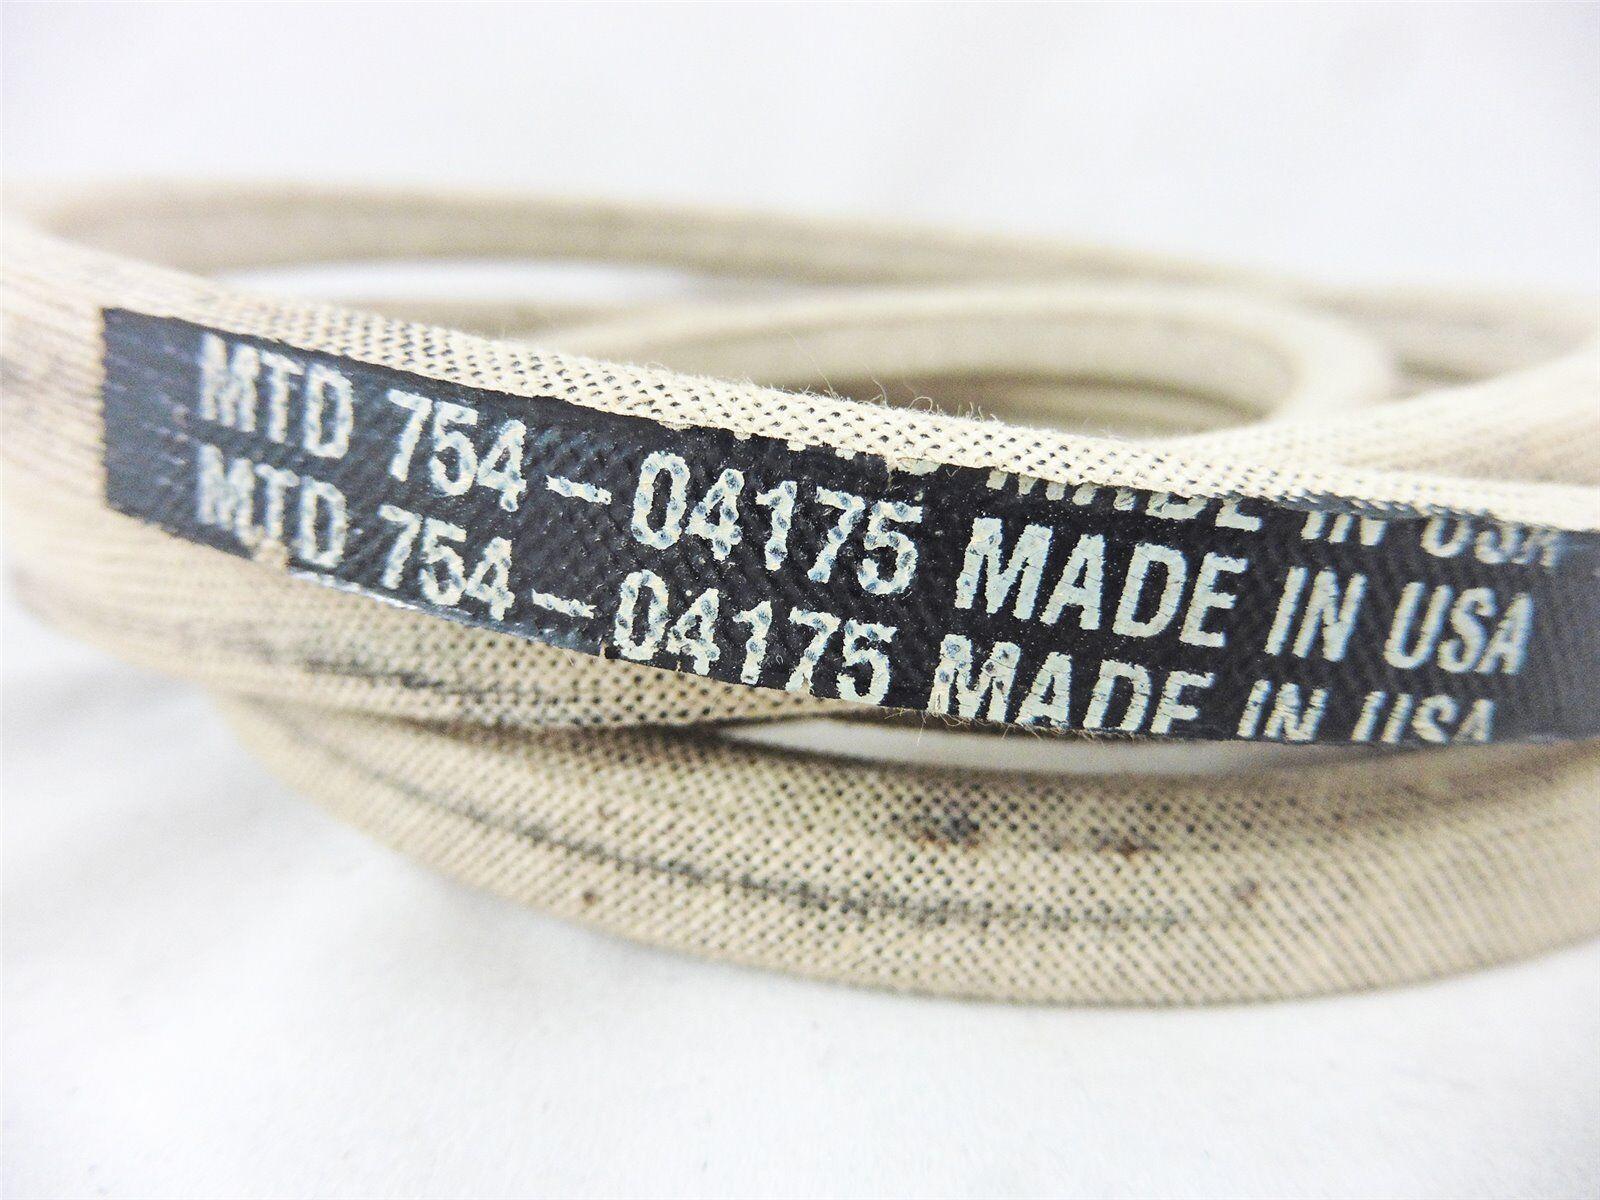 Original correas trapezoidales EFGC MTD Gutbrod cub Cadet 754-04175 sechskantiger Correa